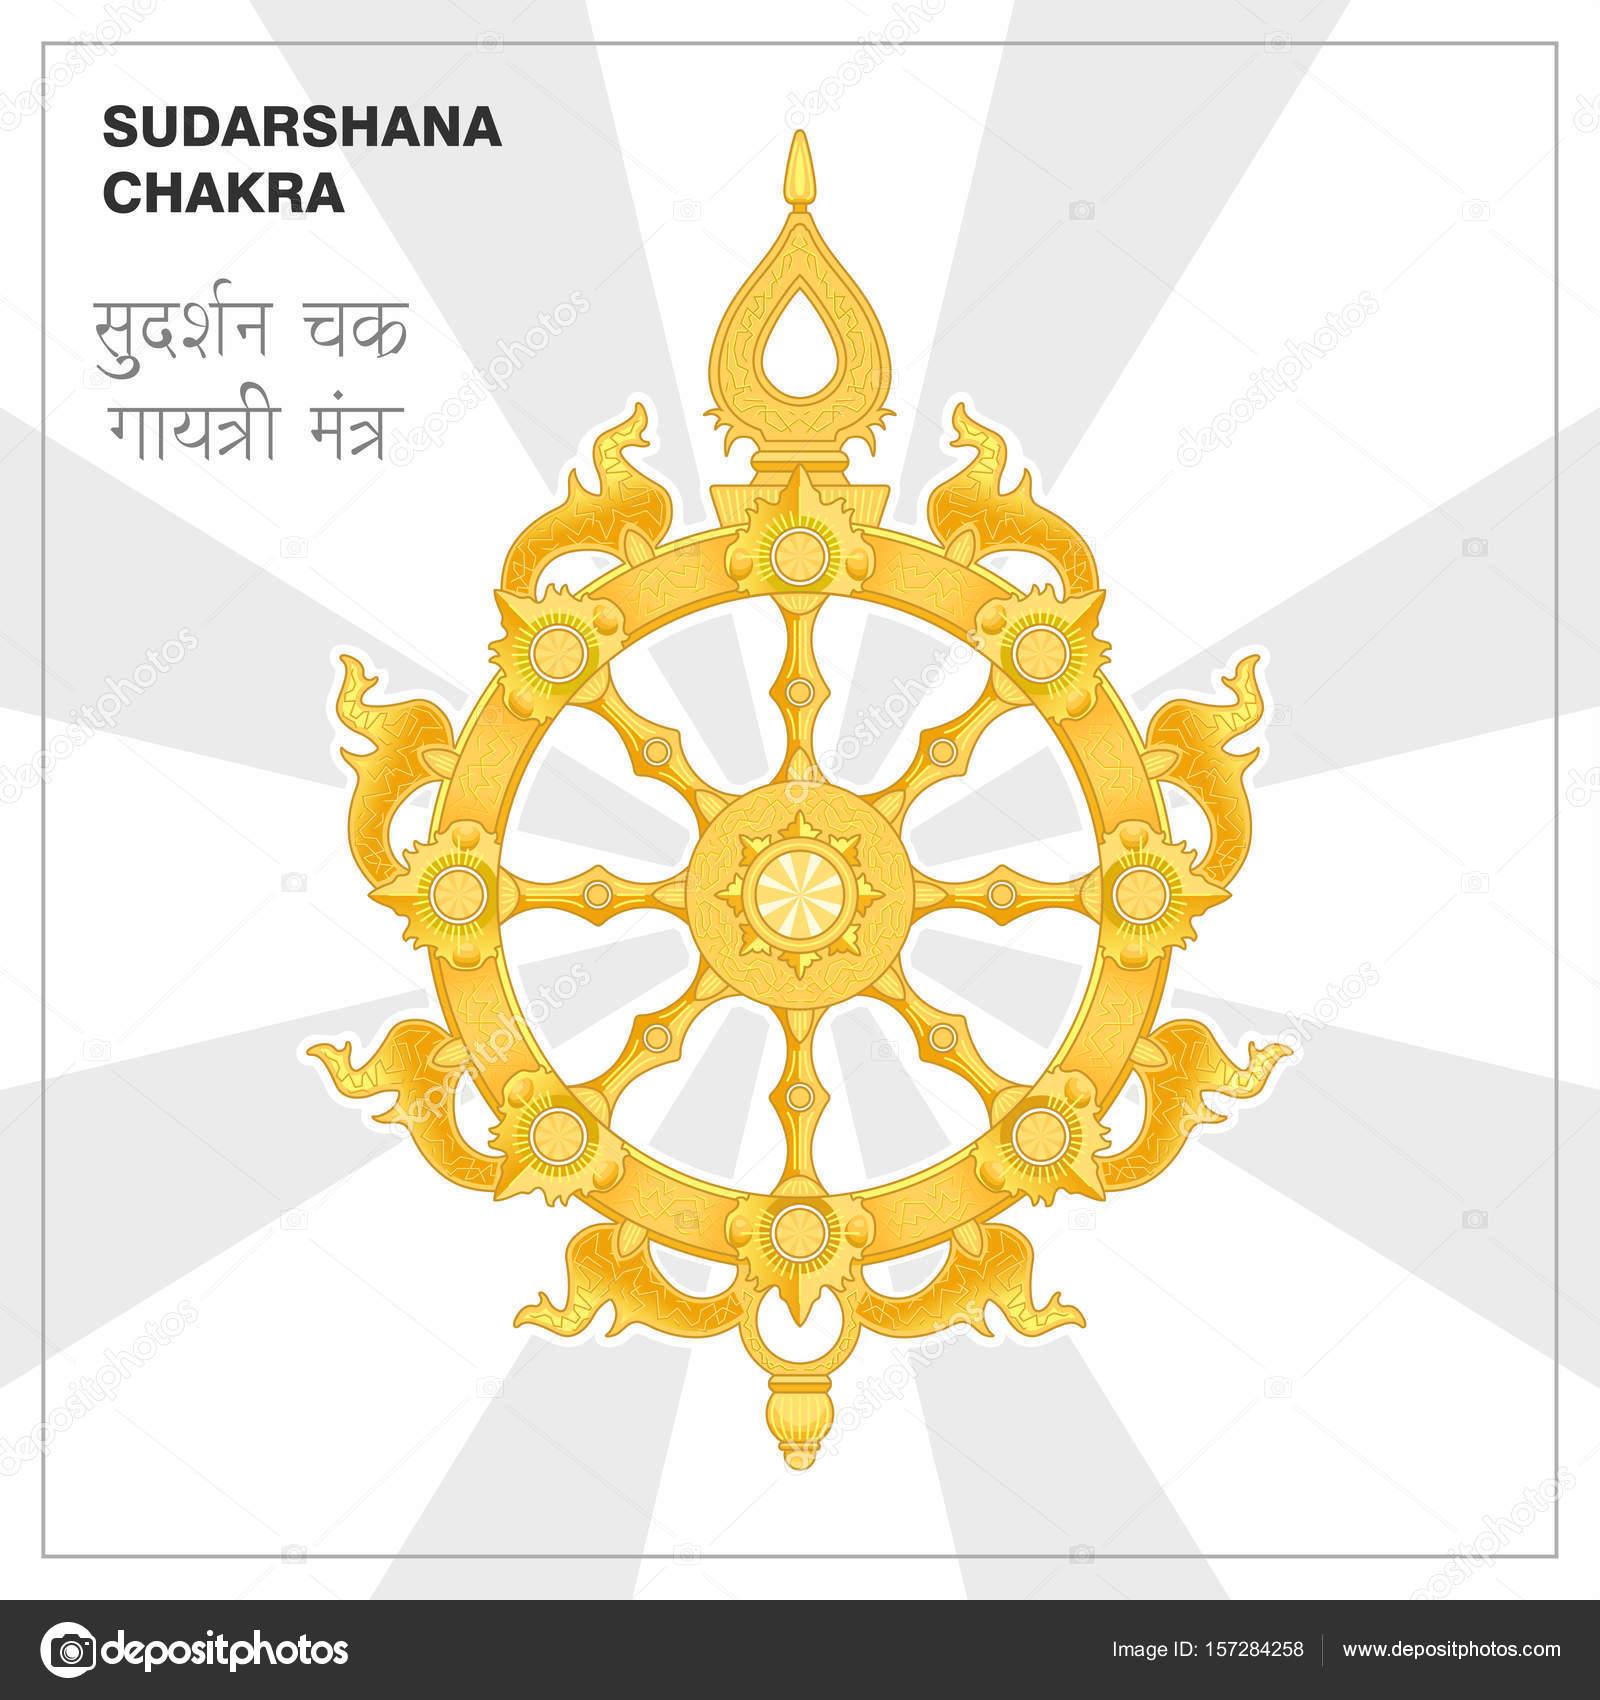 Sudarshana chakra fiery disc attribute weapon of lord krishna sudarshana chakra revolving fiery disc attribute heavenly weapon of lord sri krishna narayana and vishnu vaishnavism a religious symbol in hinduism biocorpaavc